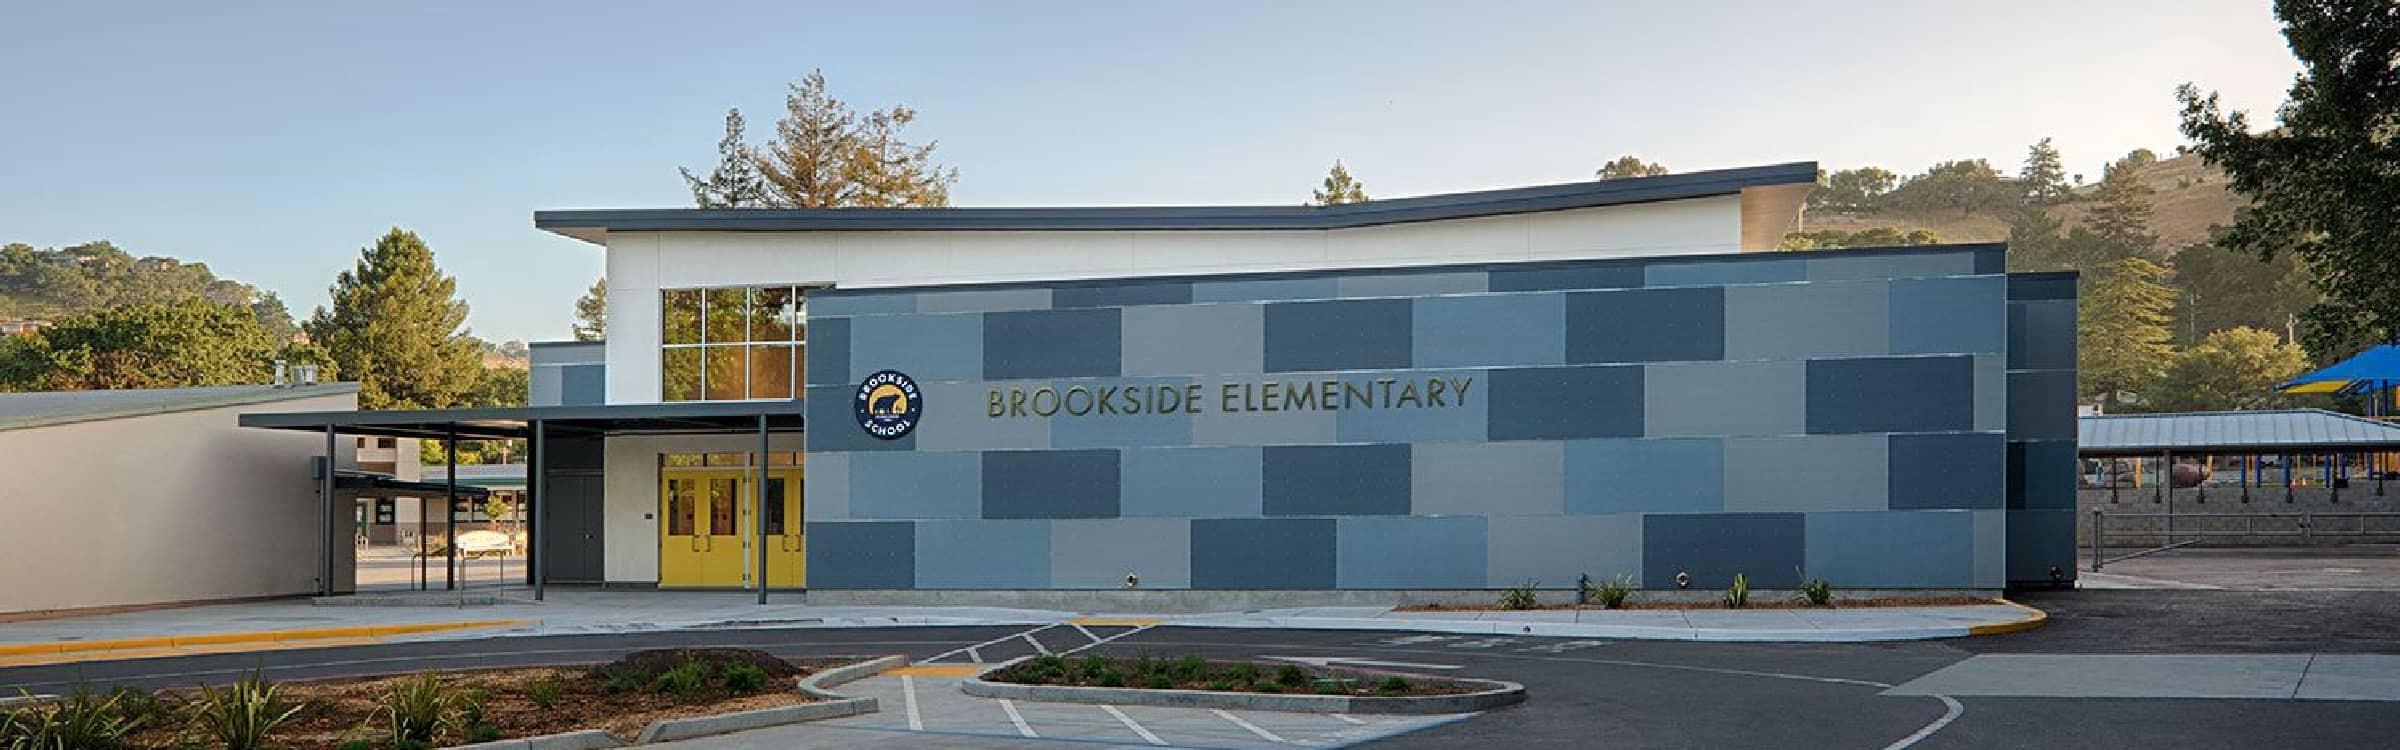 Brookside-Elementary-School-Banner-2400-x-750